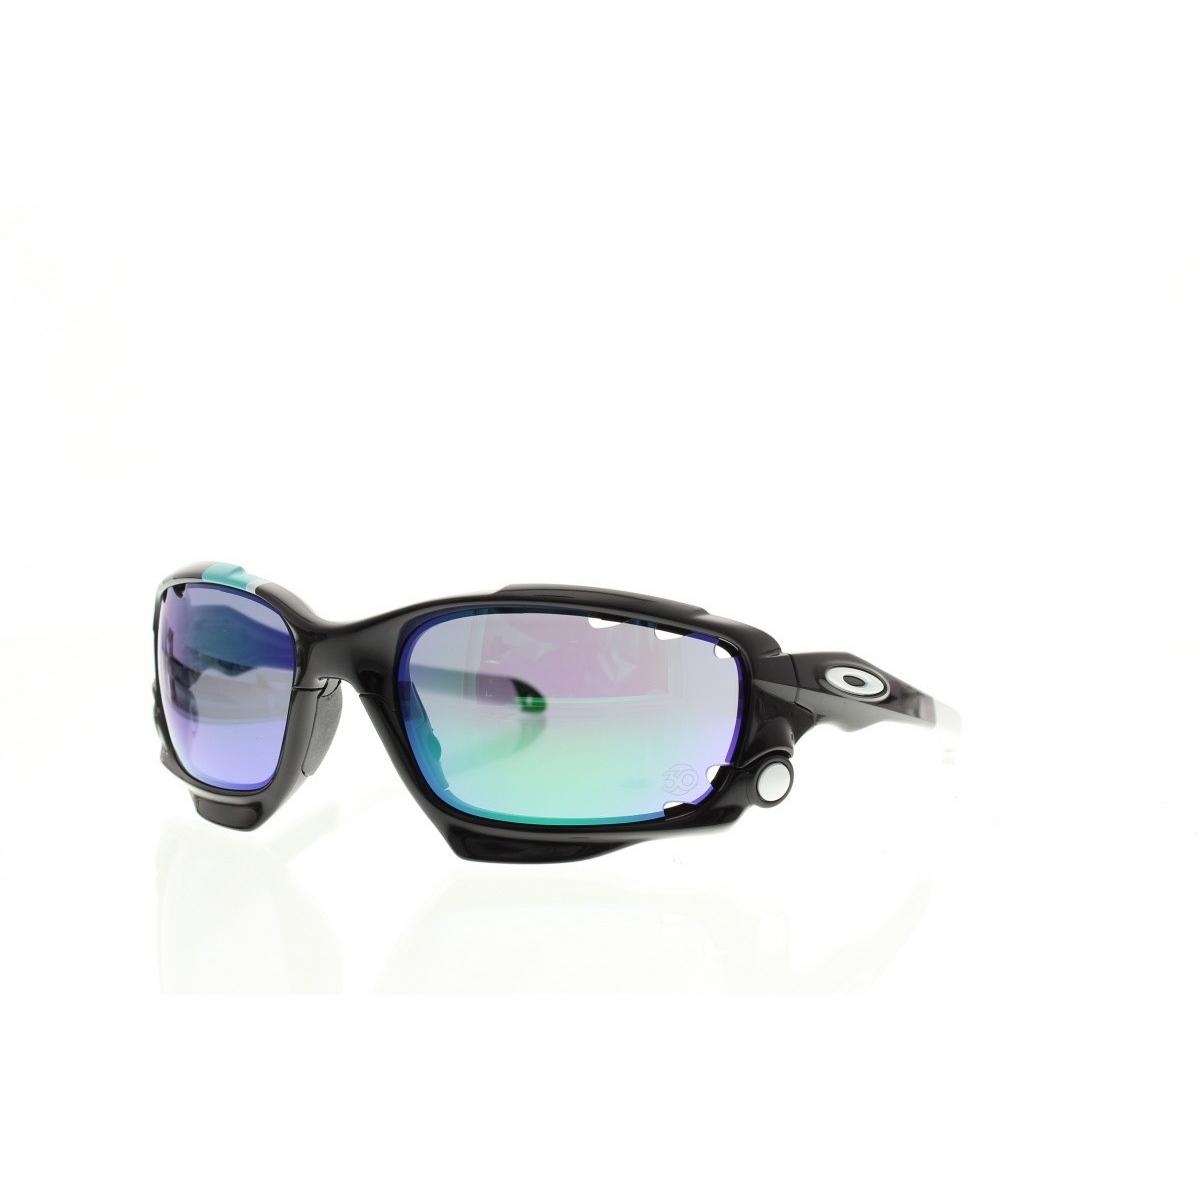 Iridium Soleil Oakley Jacket Lunette De Polished Black Racing Jade F1TlKJc